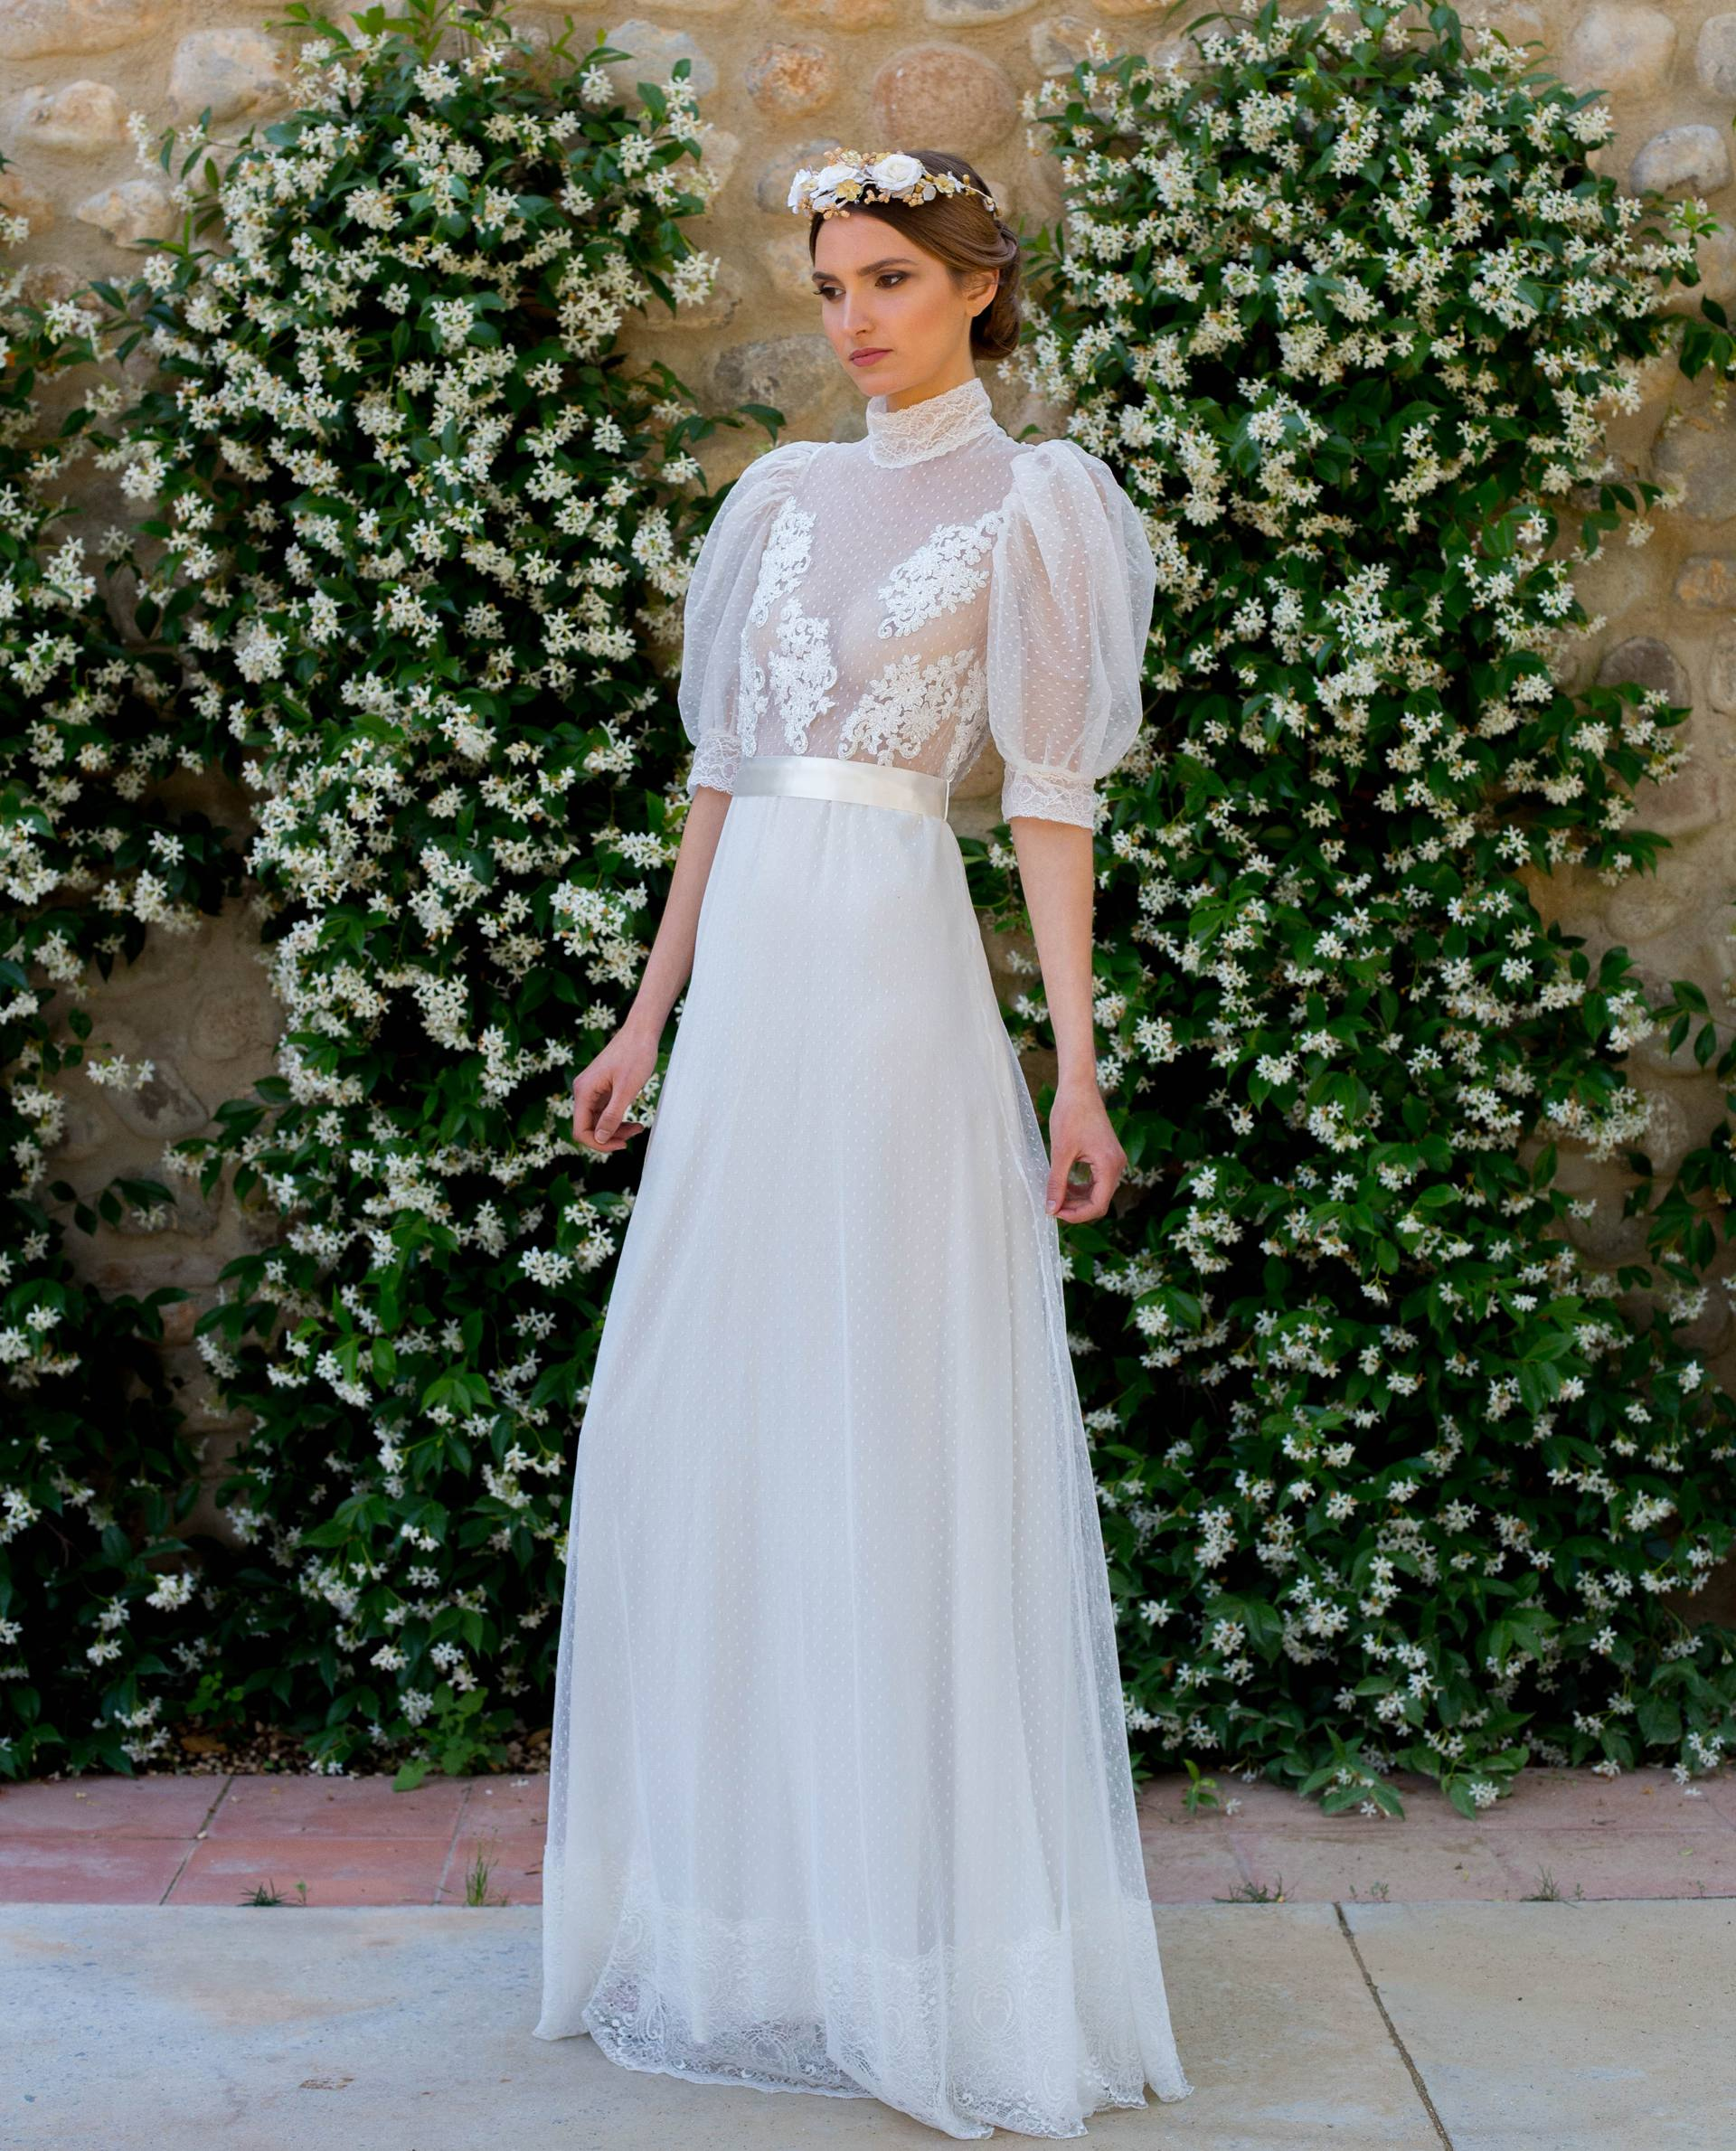 BRIDAL-NATURE 2017/18 - VESTIDOS - vestido novia Carmen